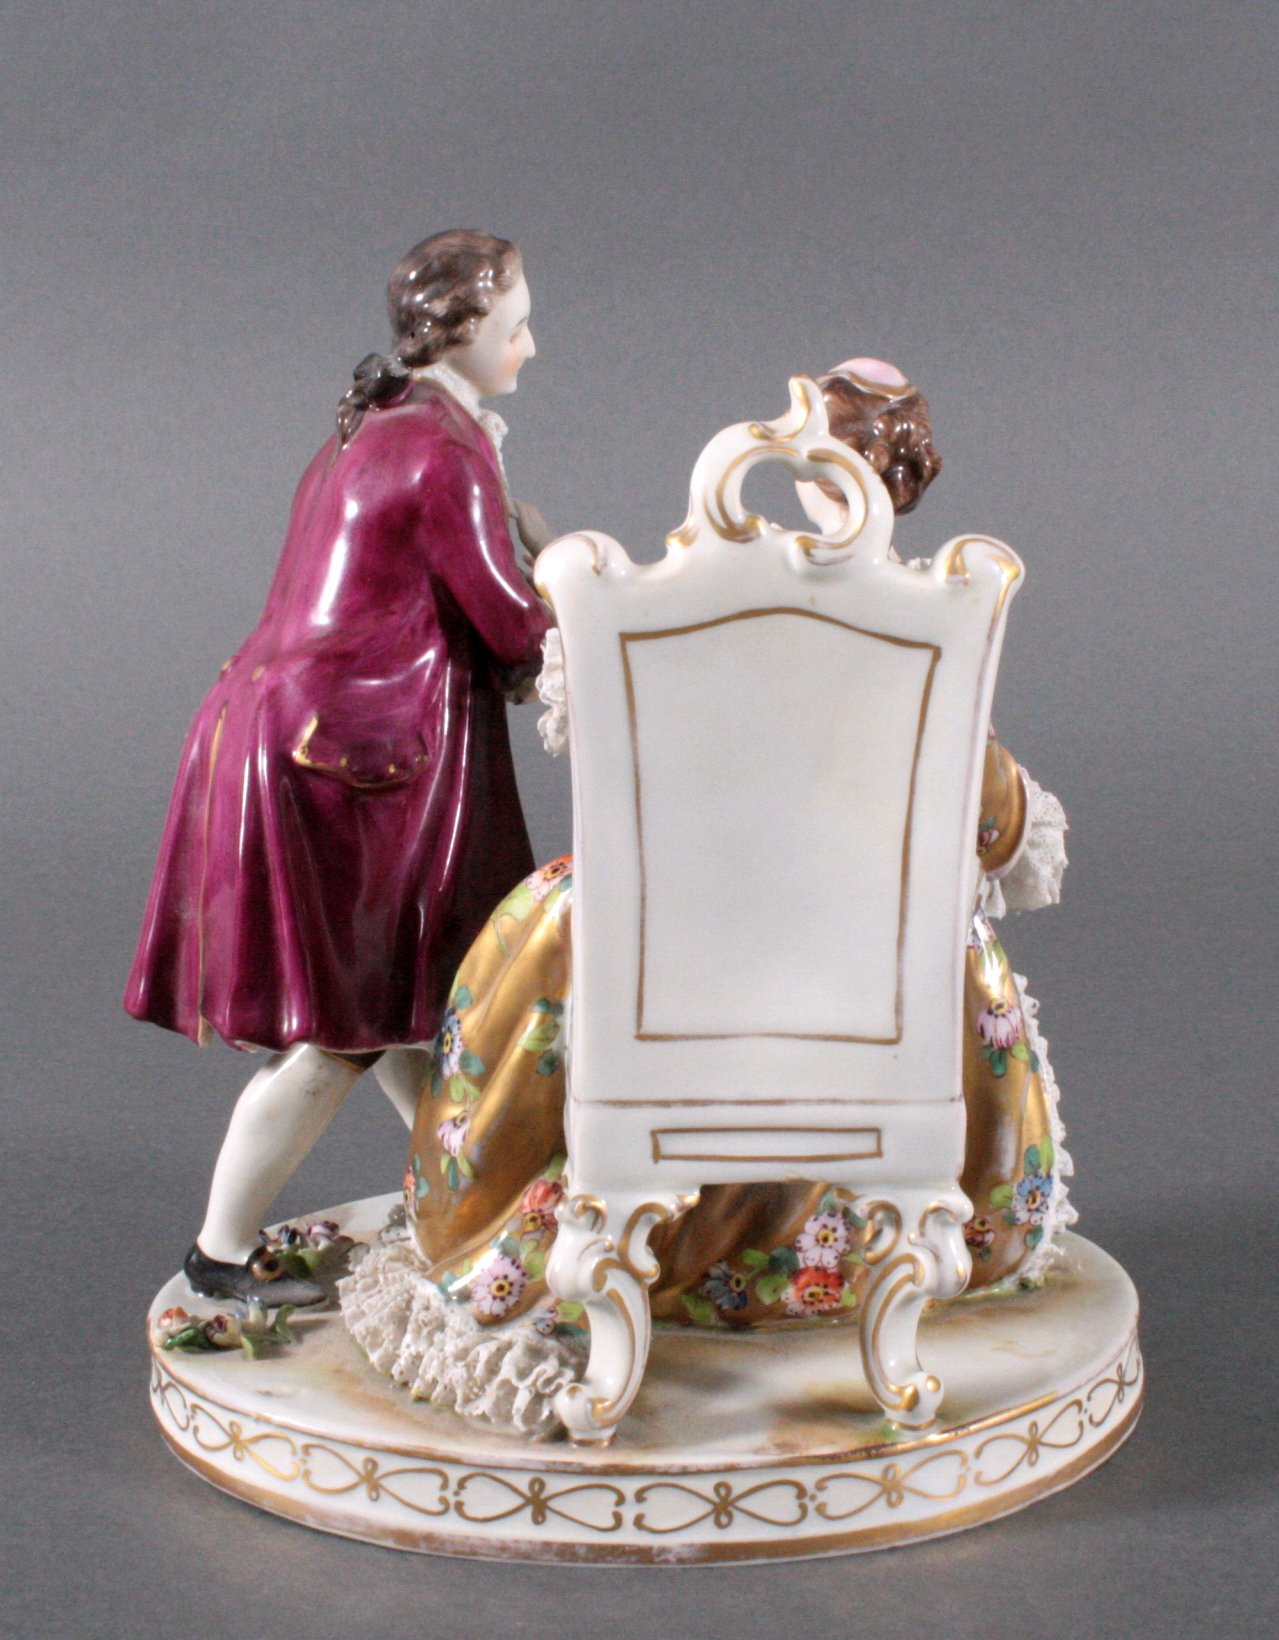 Porzellan-Skulptur, Aelteste Vokstedter-1